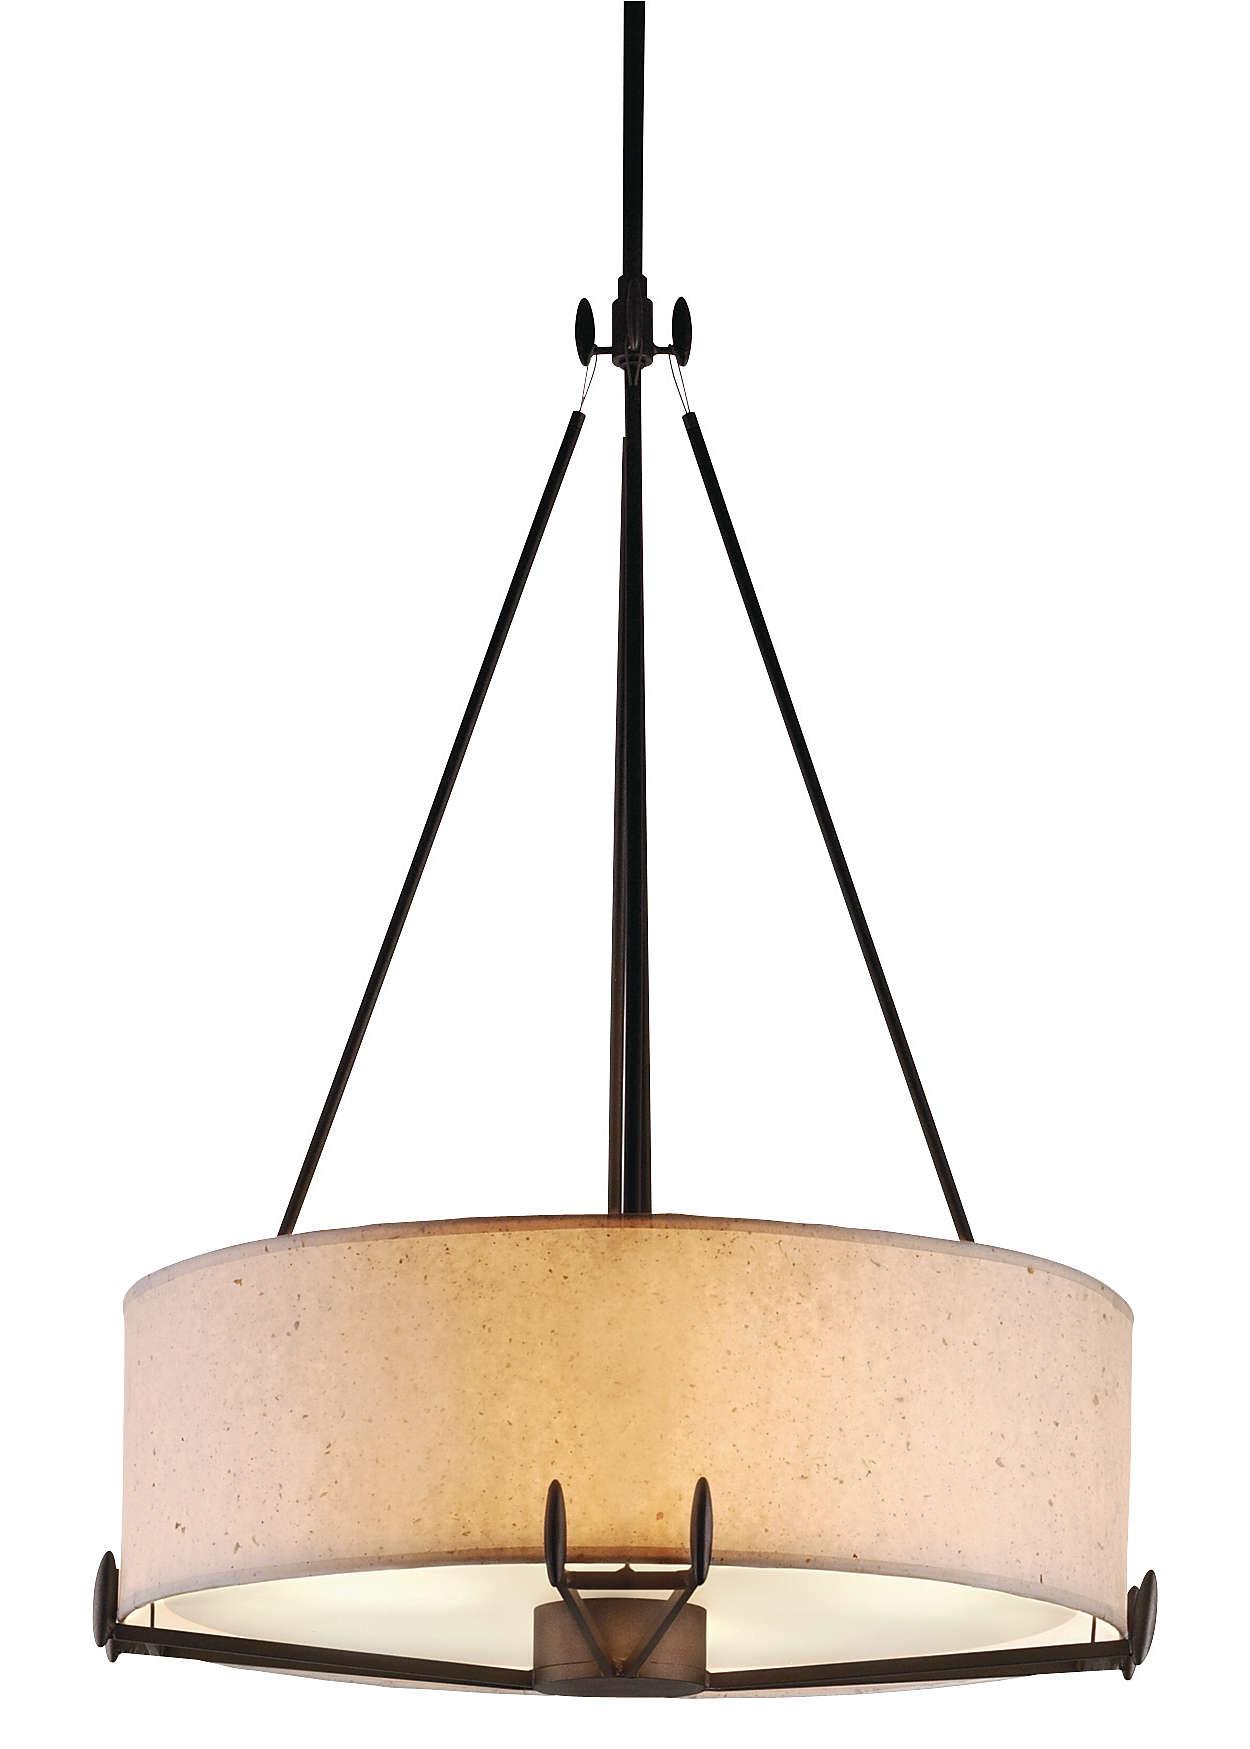 Urban Oasis 4-light Pendant, Bronze Luster finish